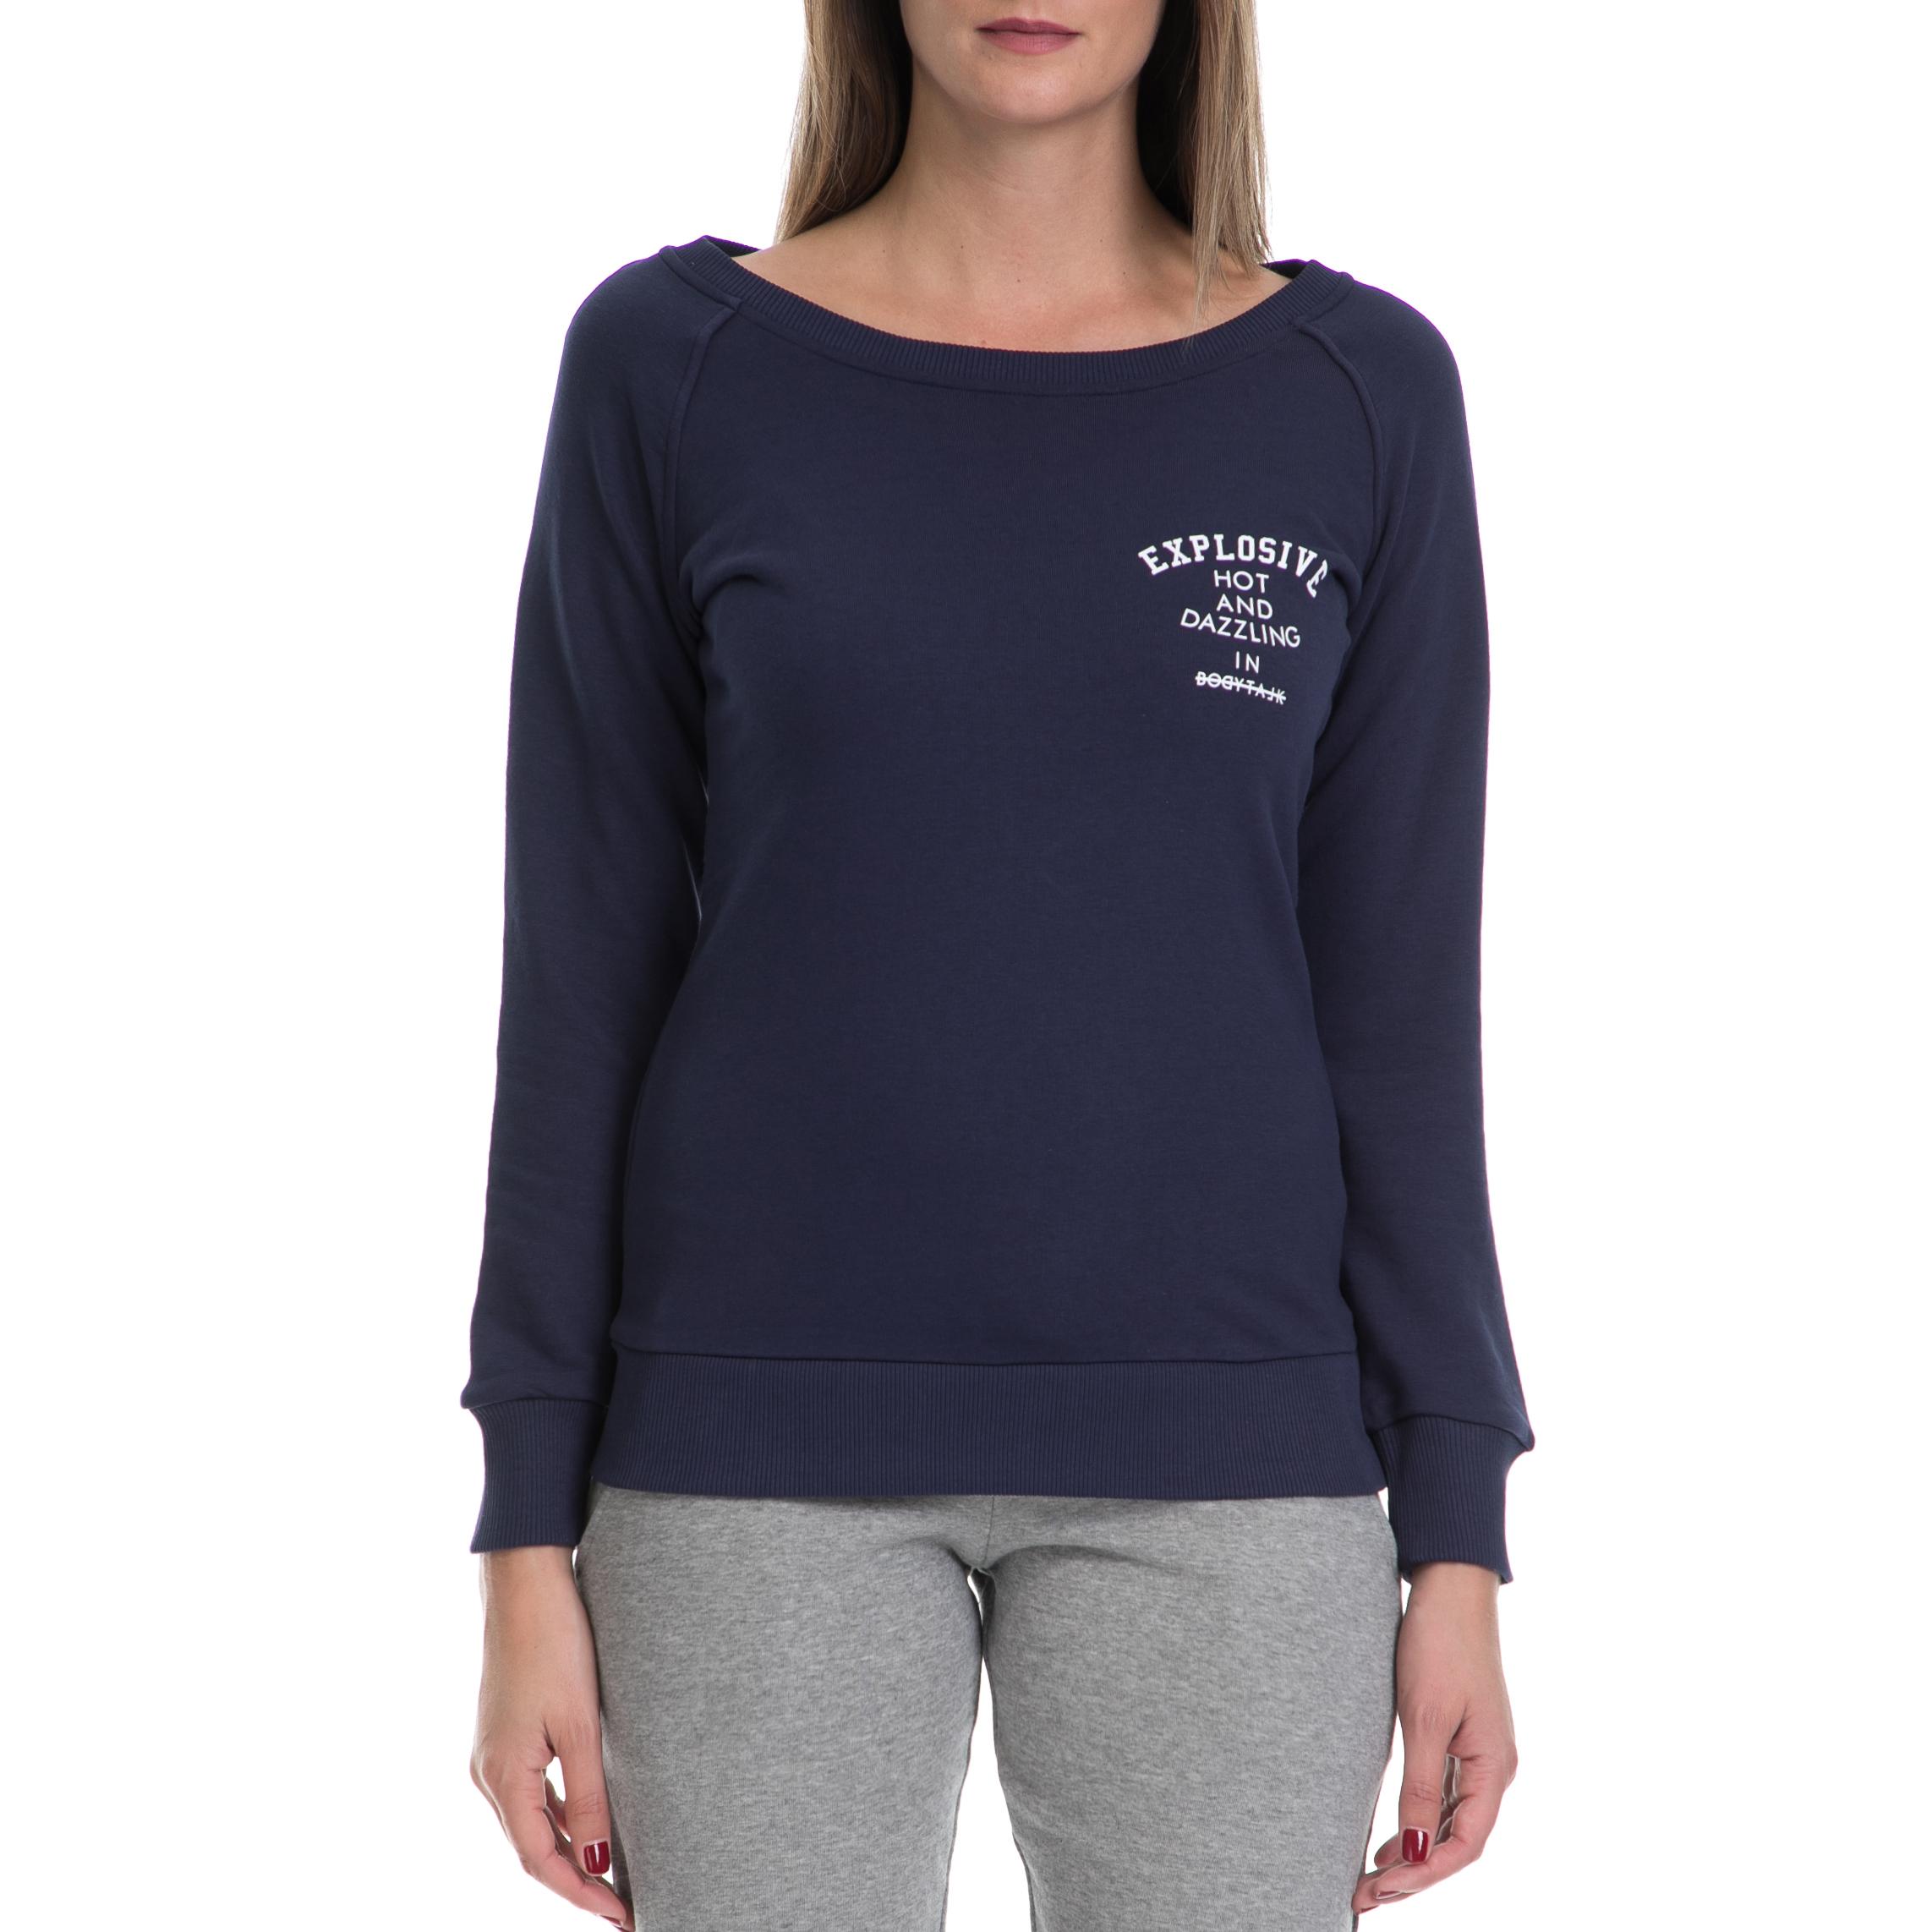 BODYTALK - Γυναικεία μπλούζα BODYTALK μπλε γυναικεία ρούχα αθλητικά φούτερ μακρυμάνικα